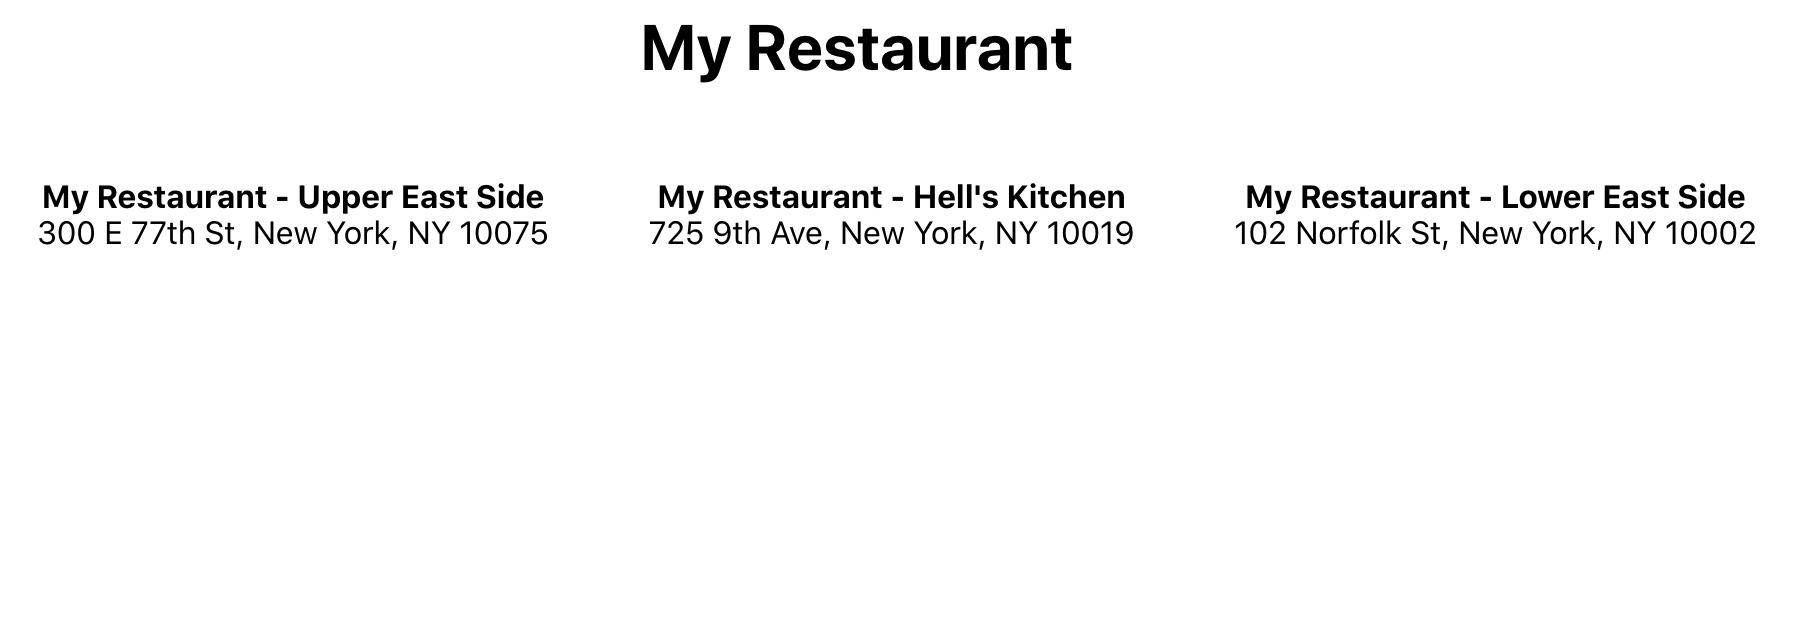 My Restaurant app showing three adresses